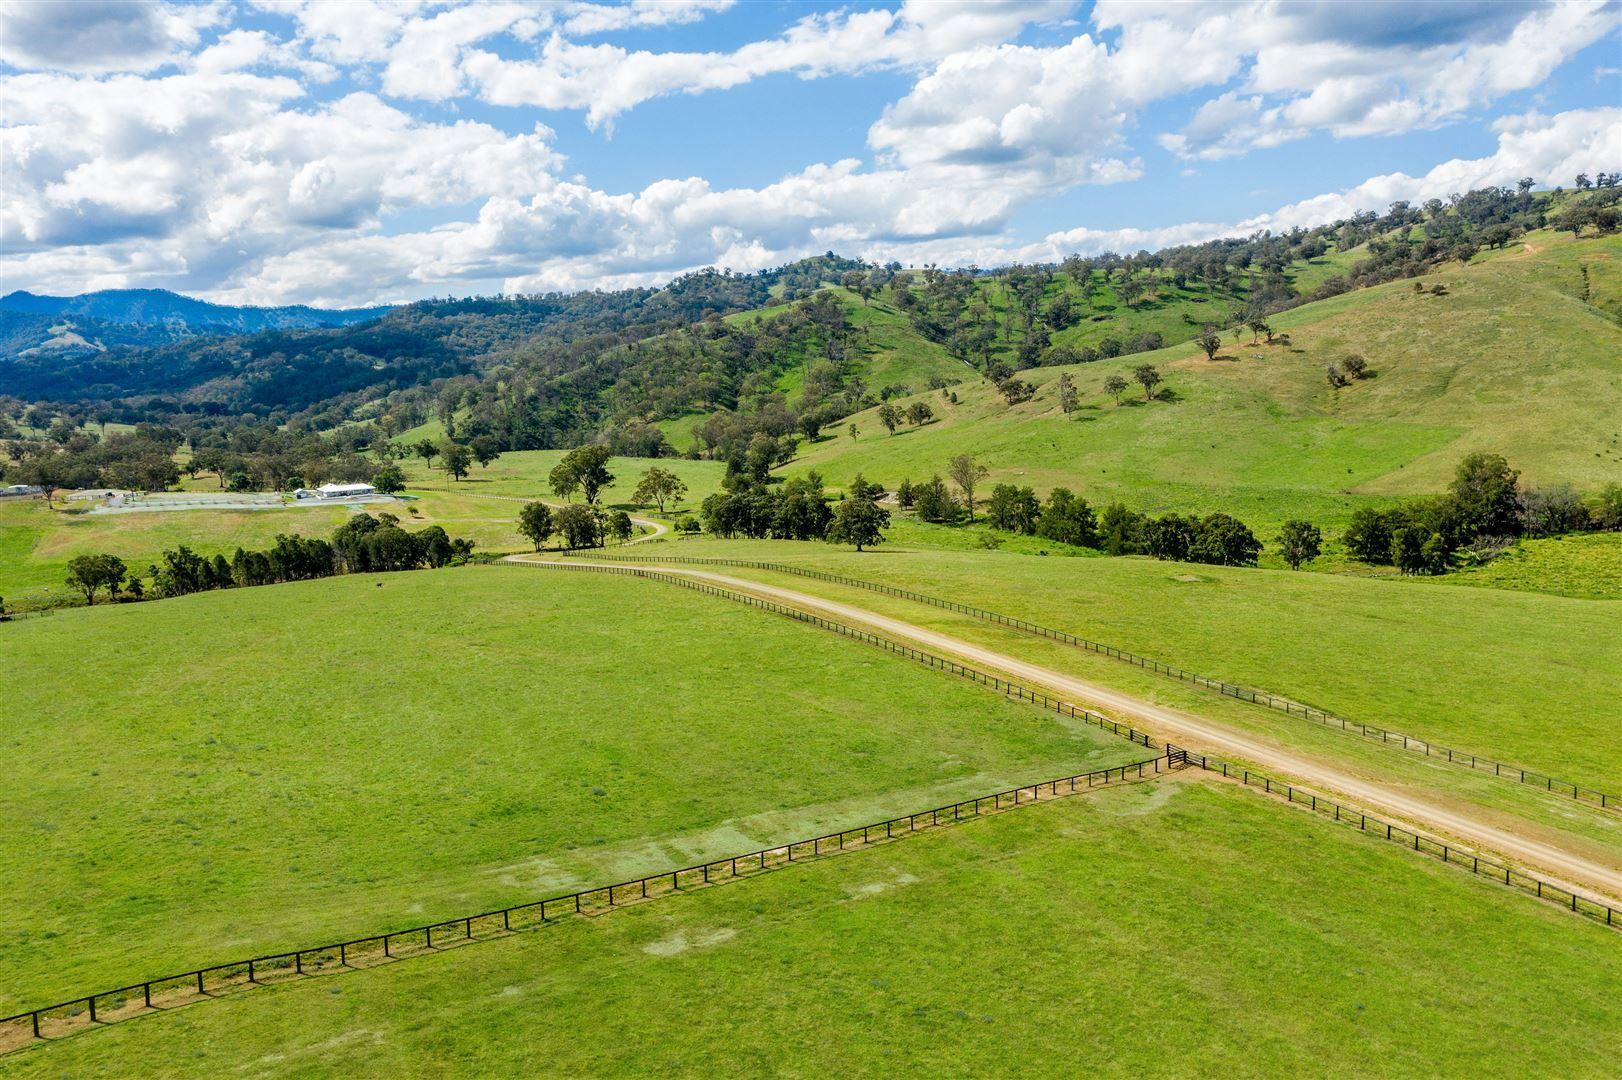 'Timor Cattle', Timor Creek Rd, Murrurundi NSW 2338, Image 2